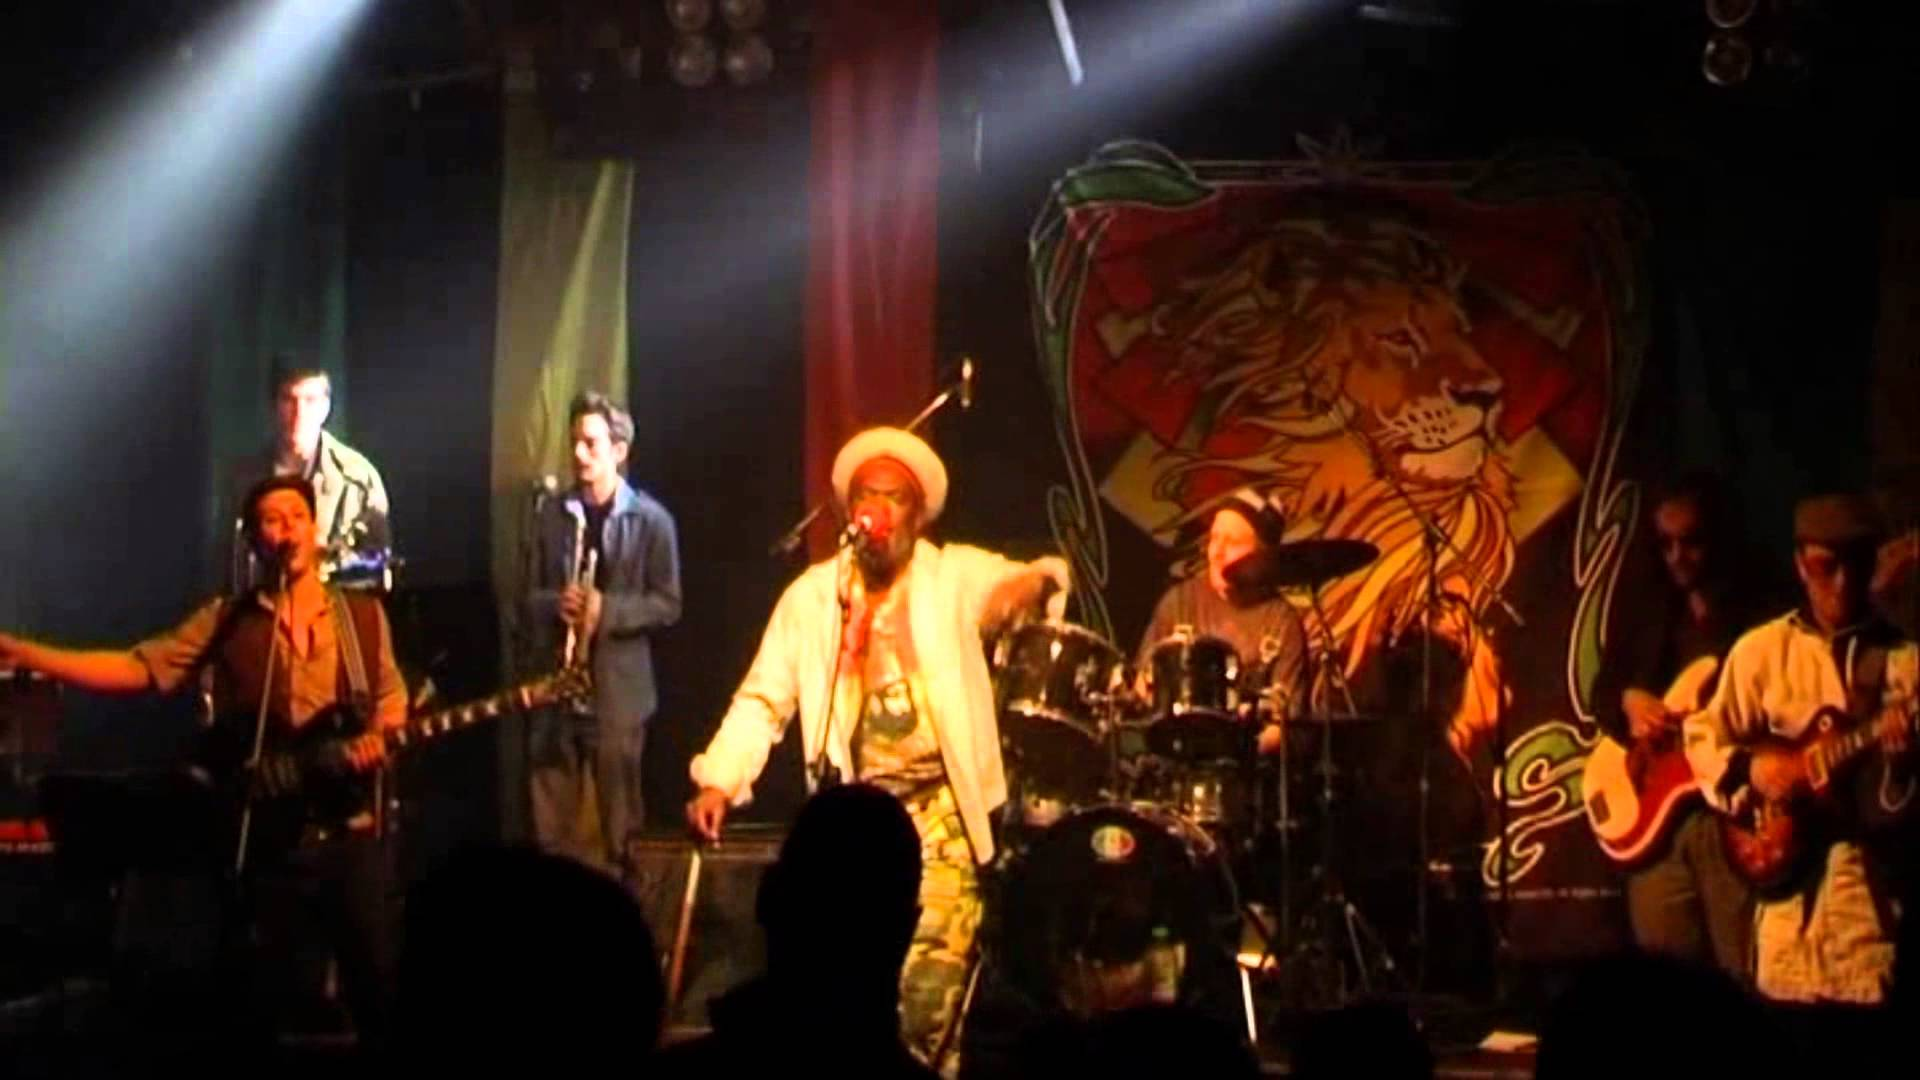 Apple Gabriel & Zvuloon Dub System in Tel Aviv, Israel @ Barbi Club [12/18/2009]